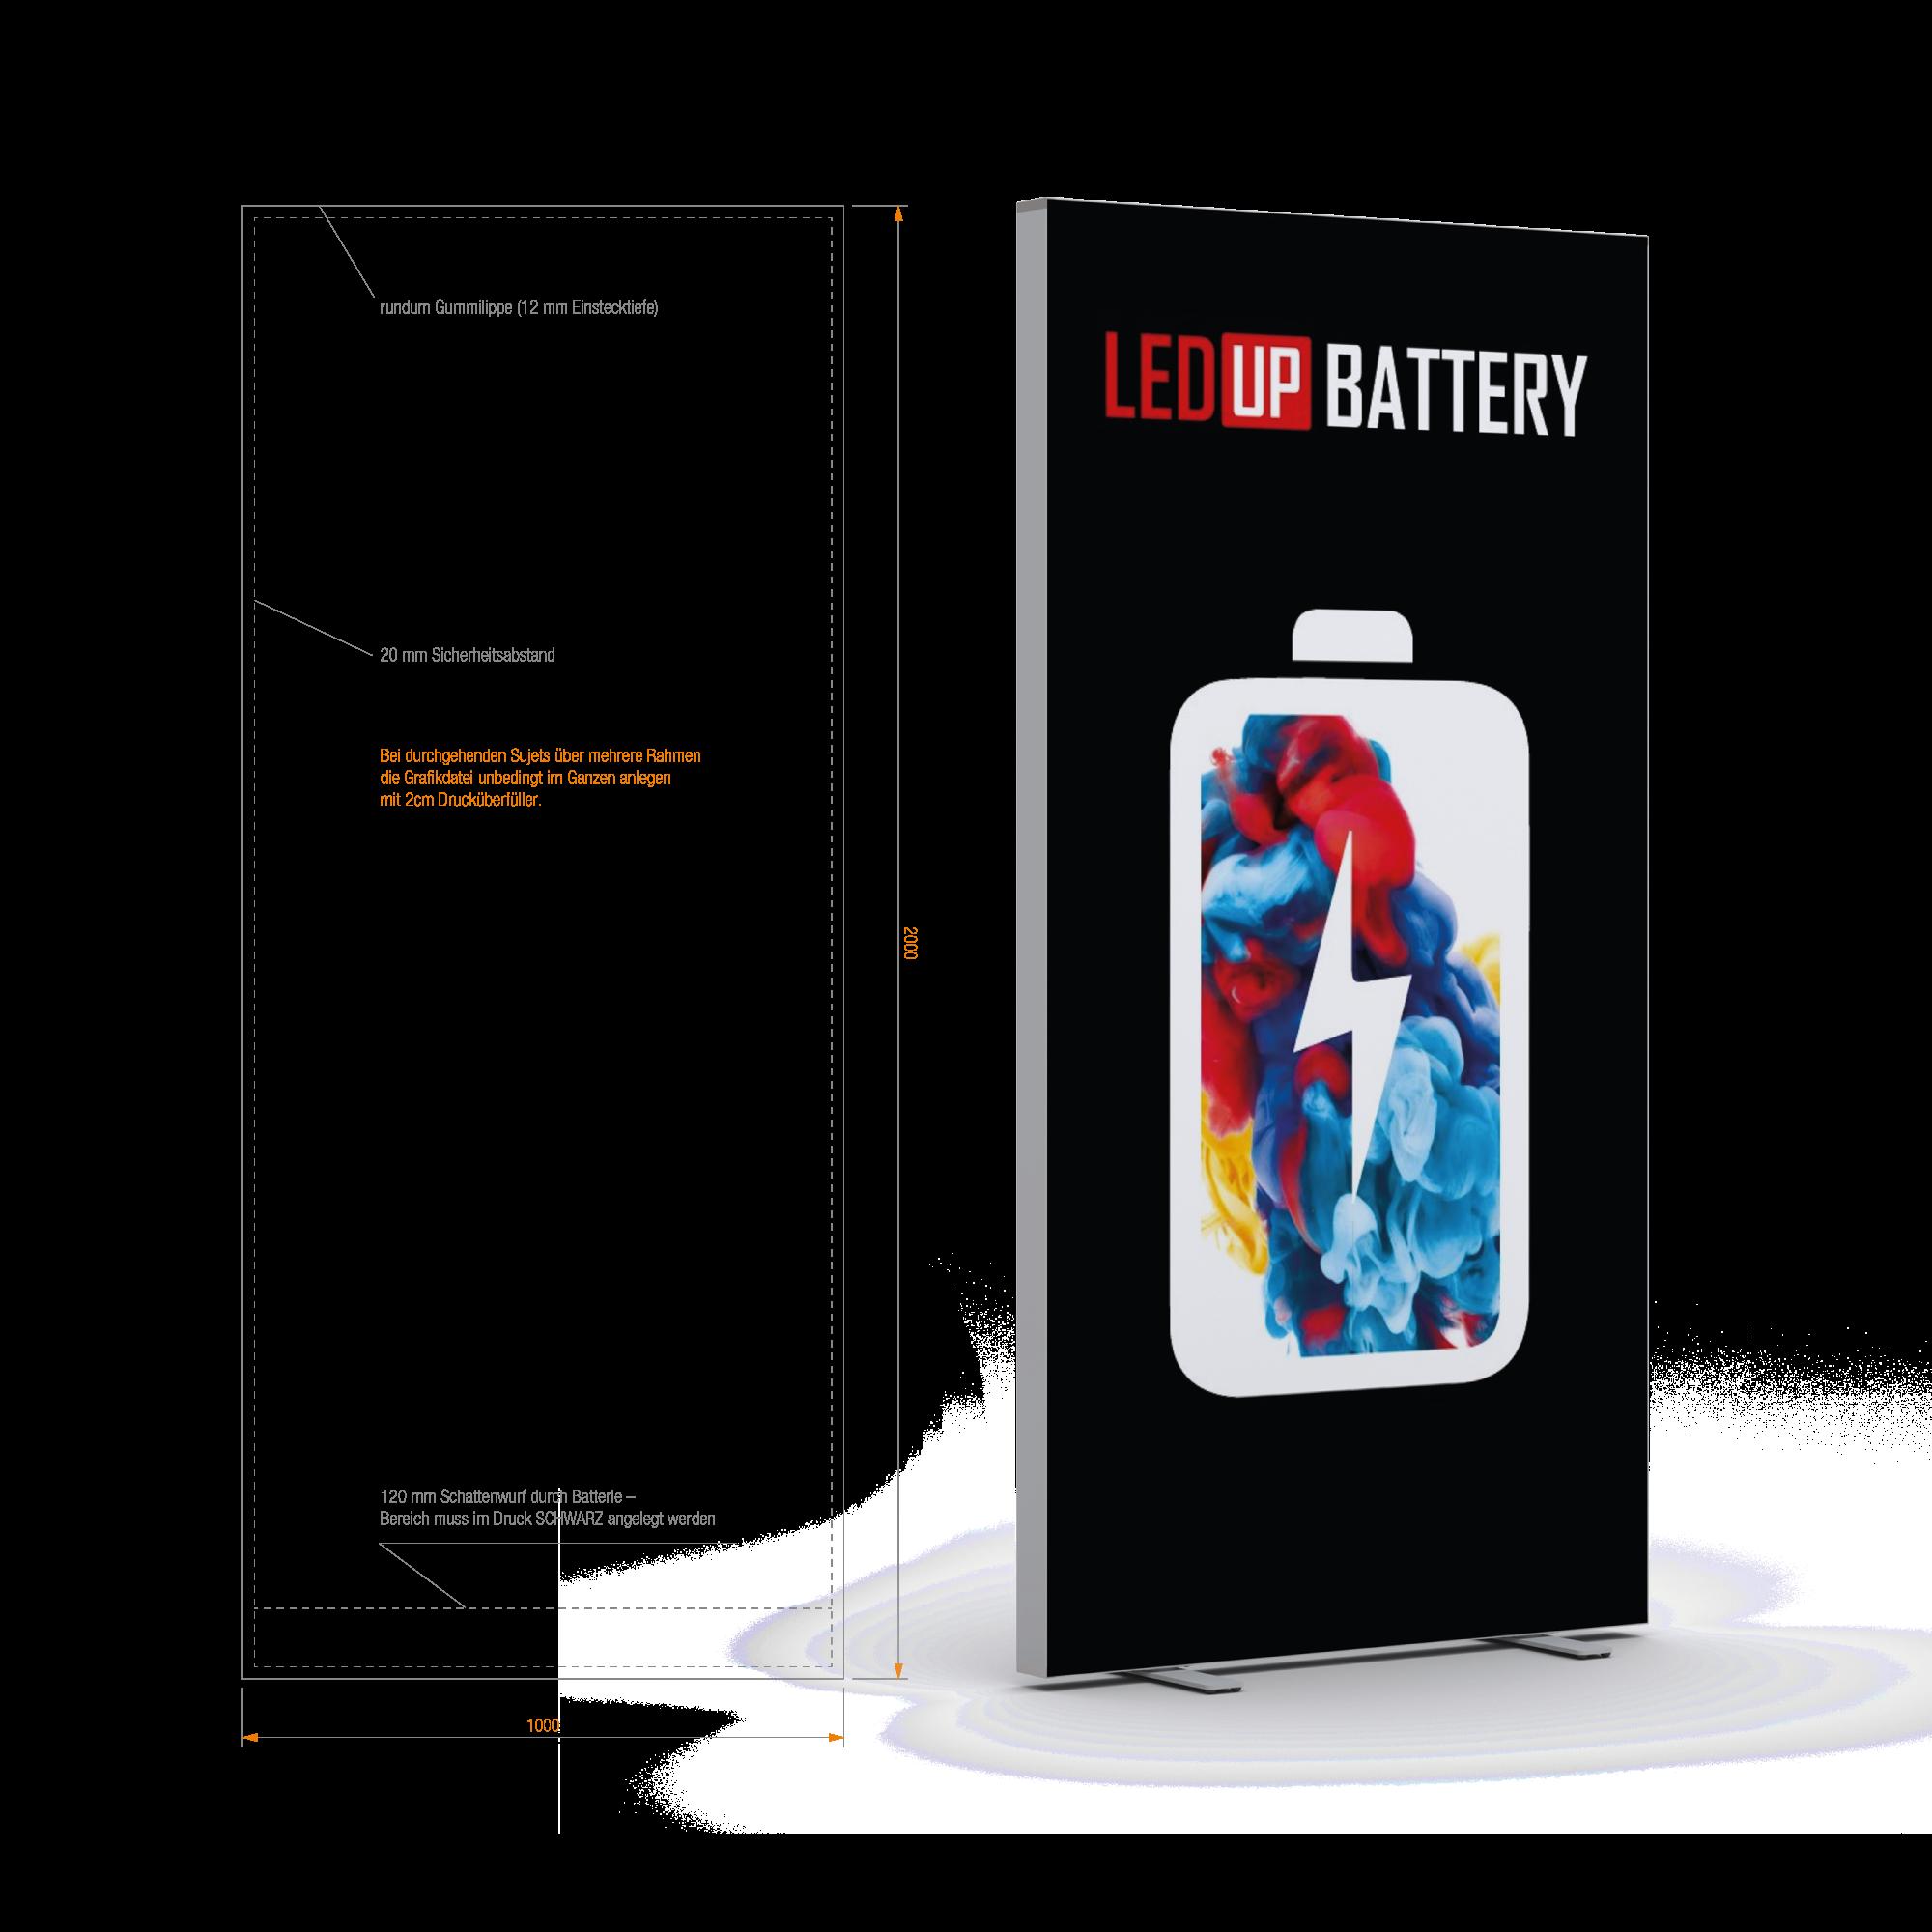 ledup-battery-druckdaten